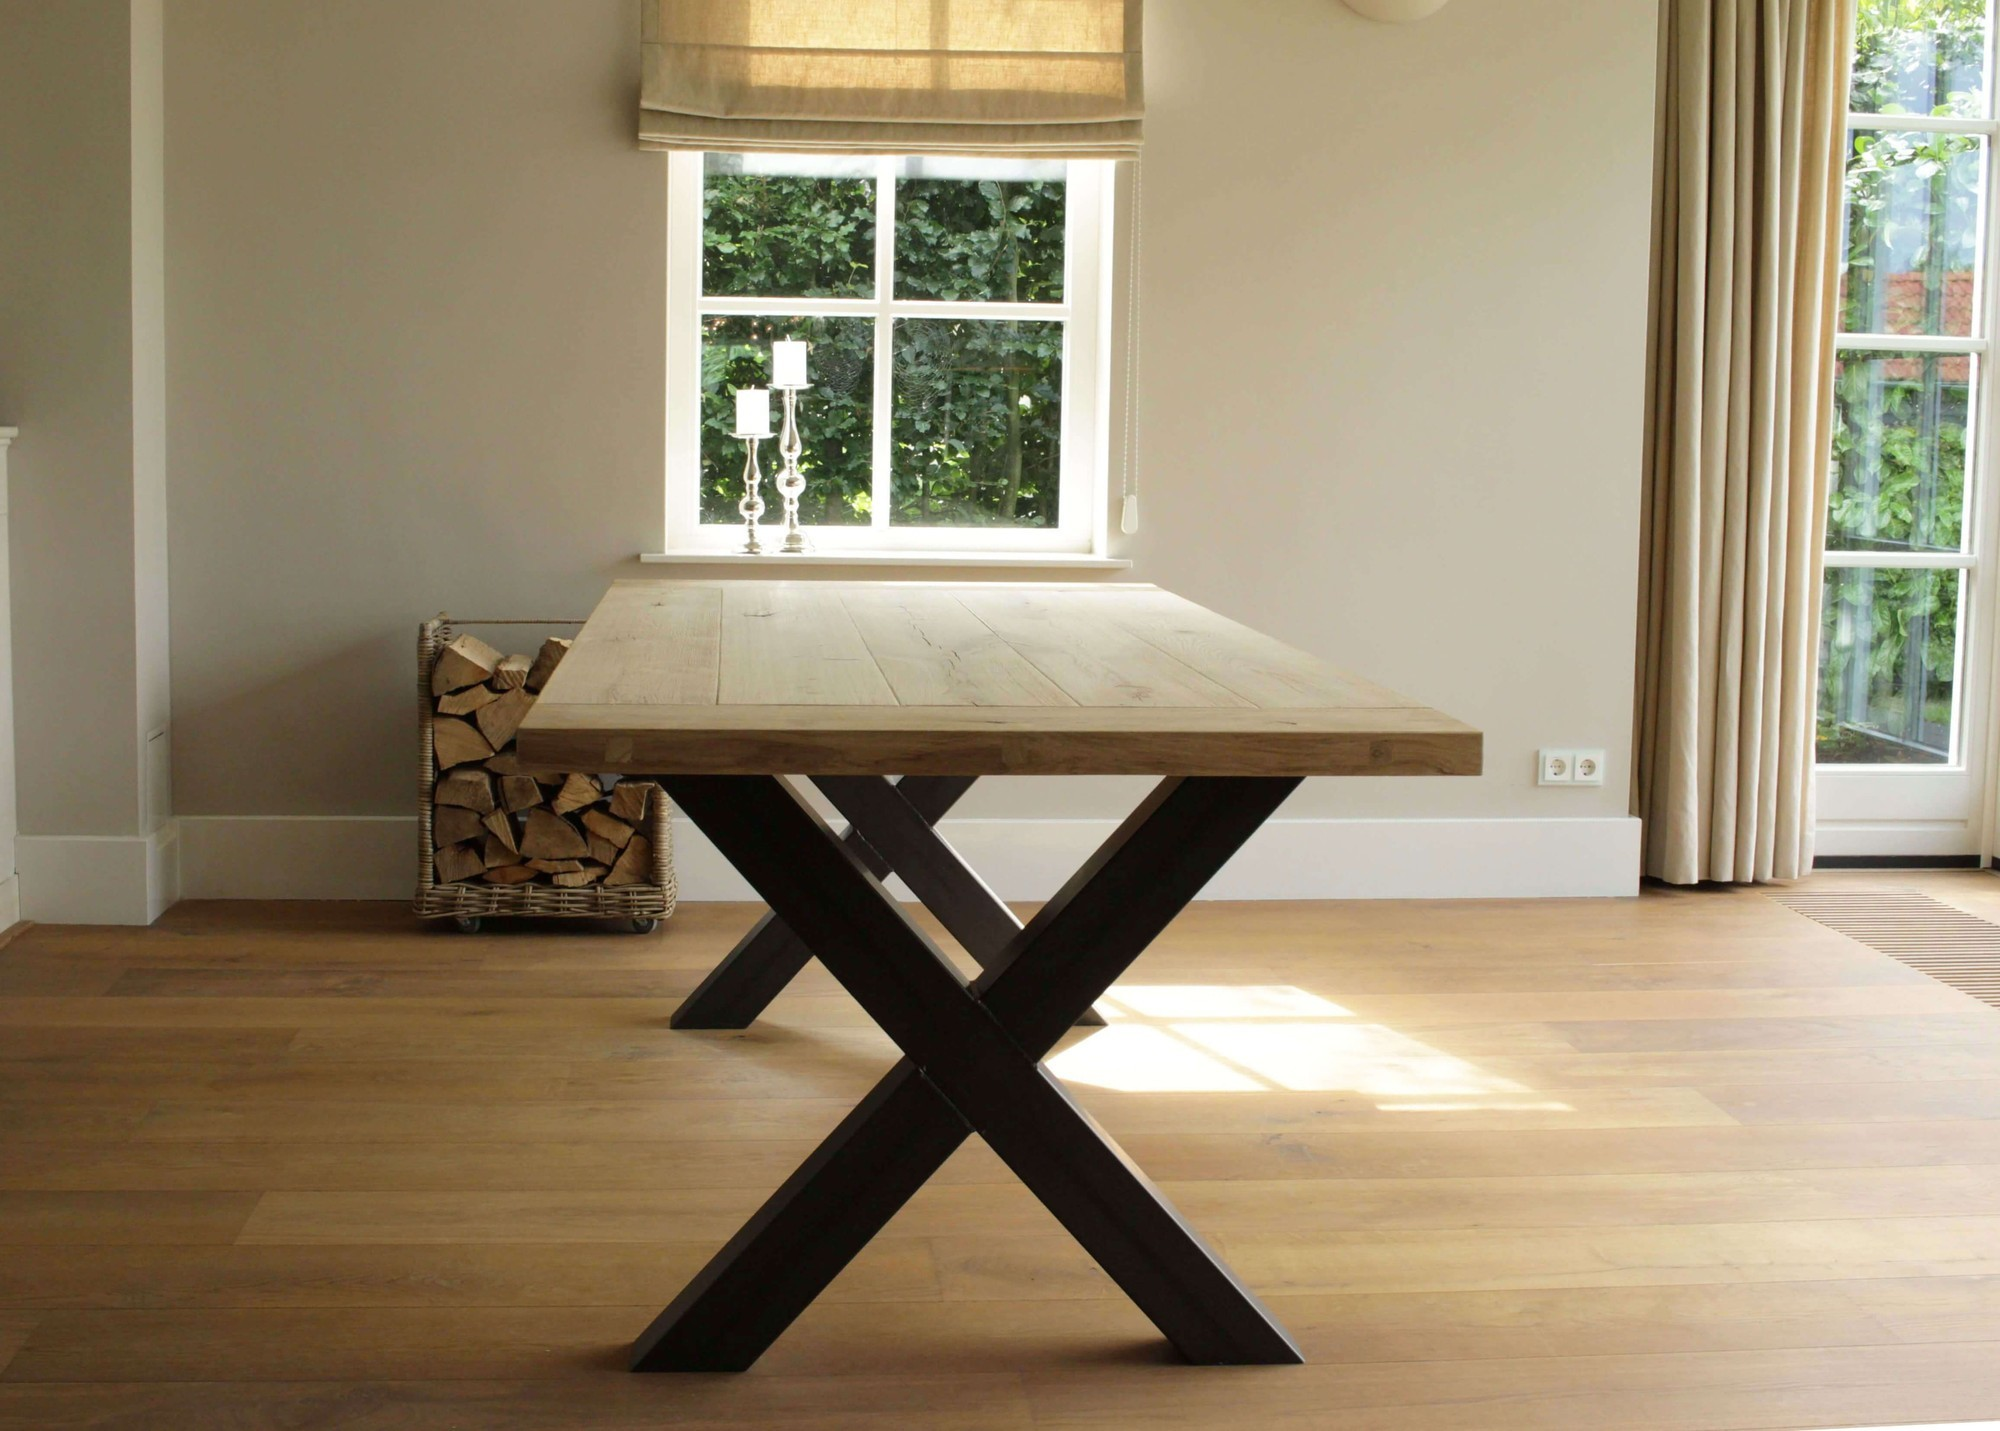 Industriele Tafel Goedkoop : Industriele tafel glasgow met eiken blad shop hier